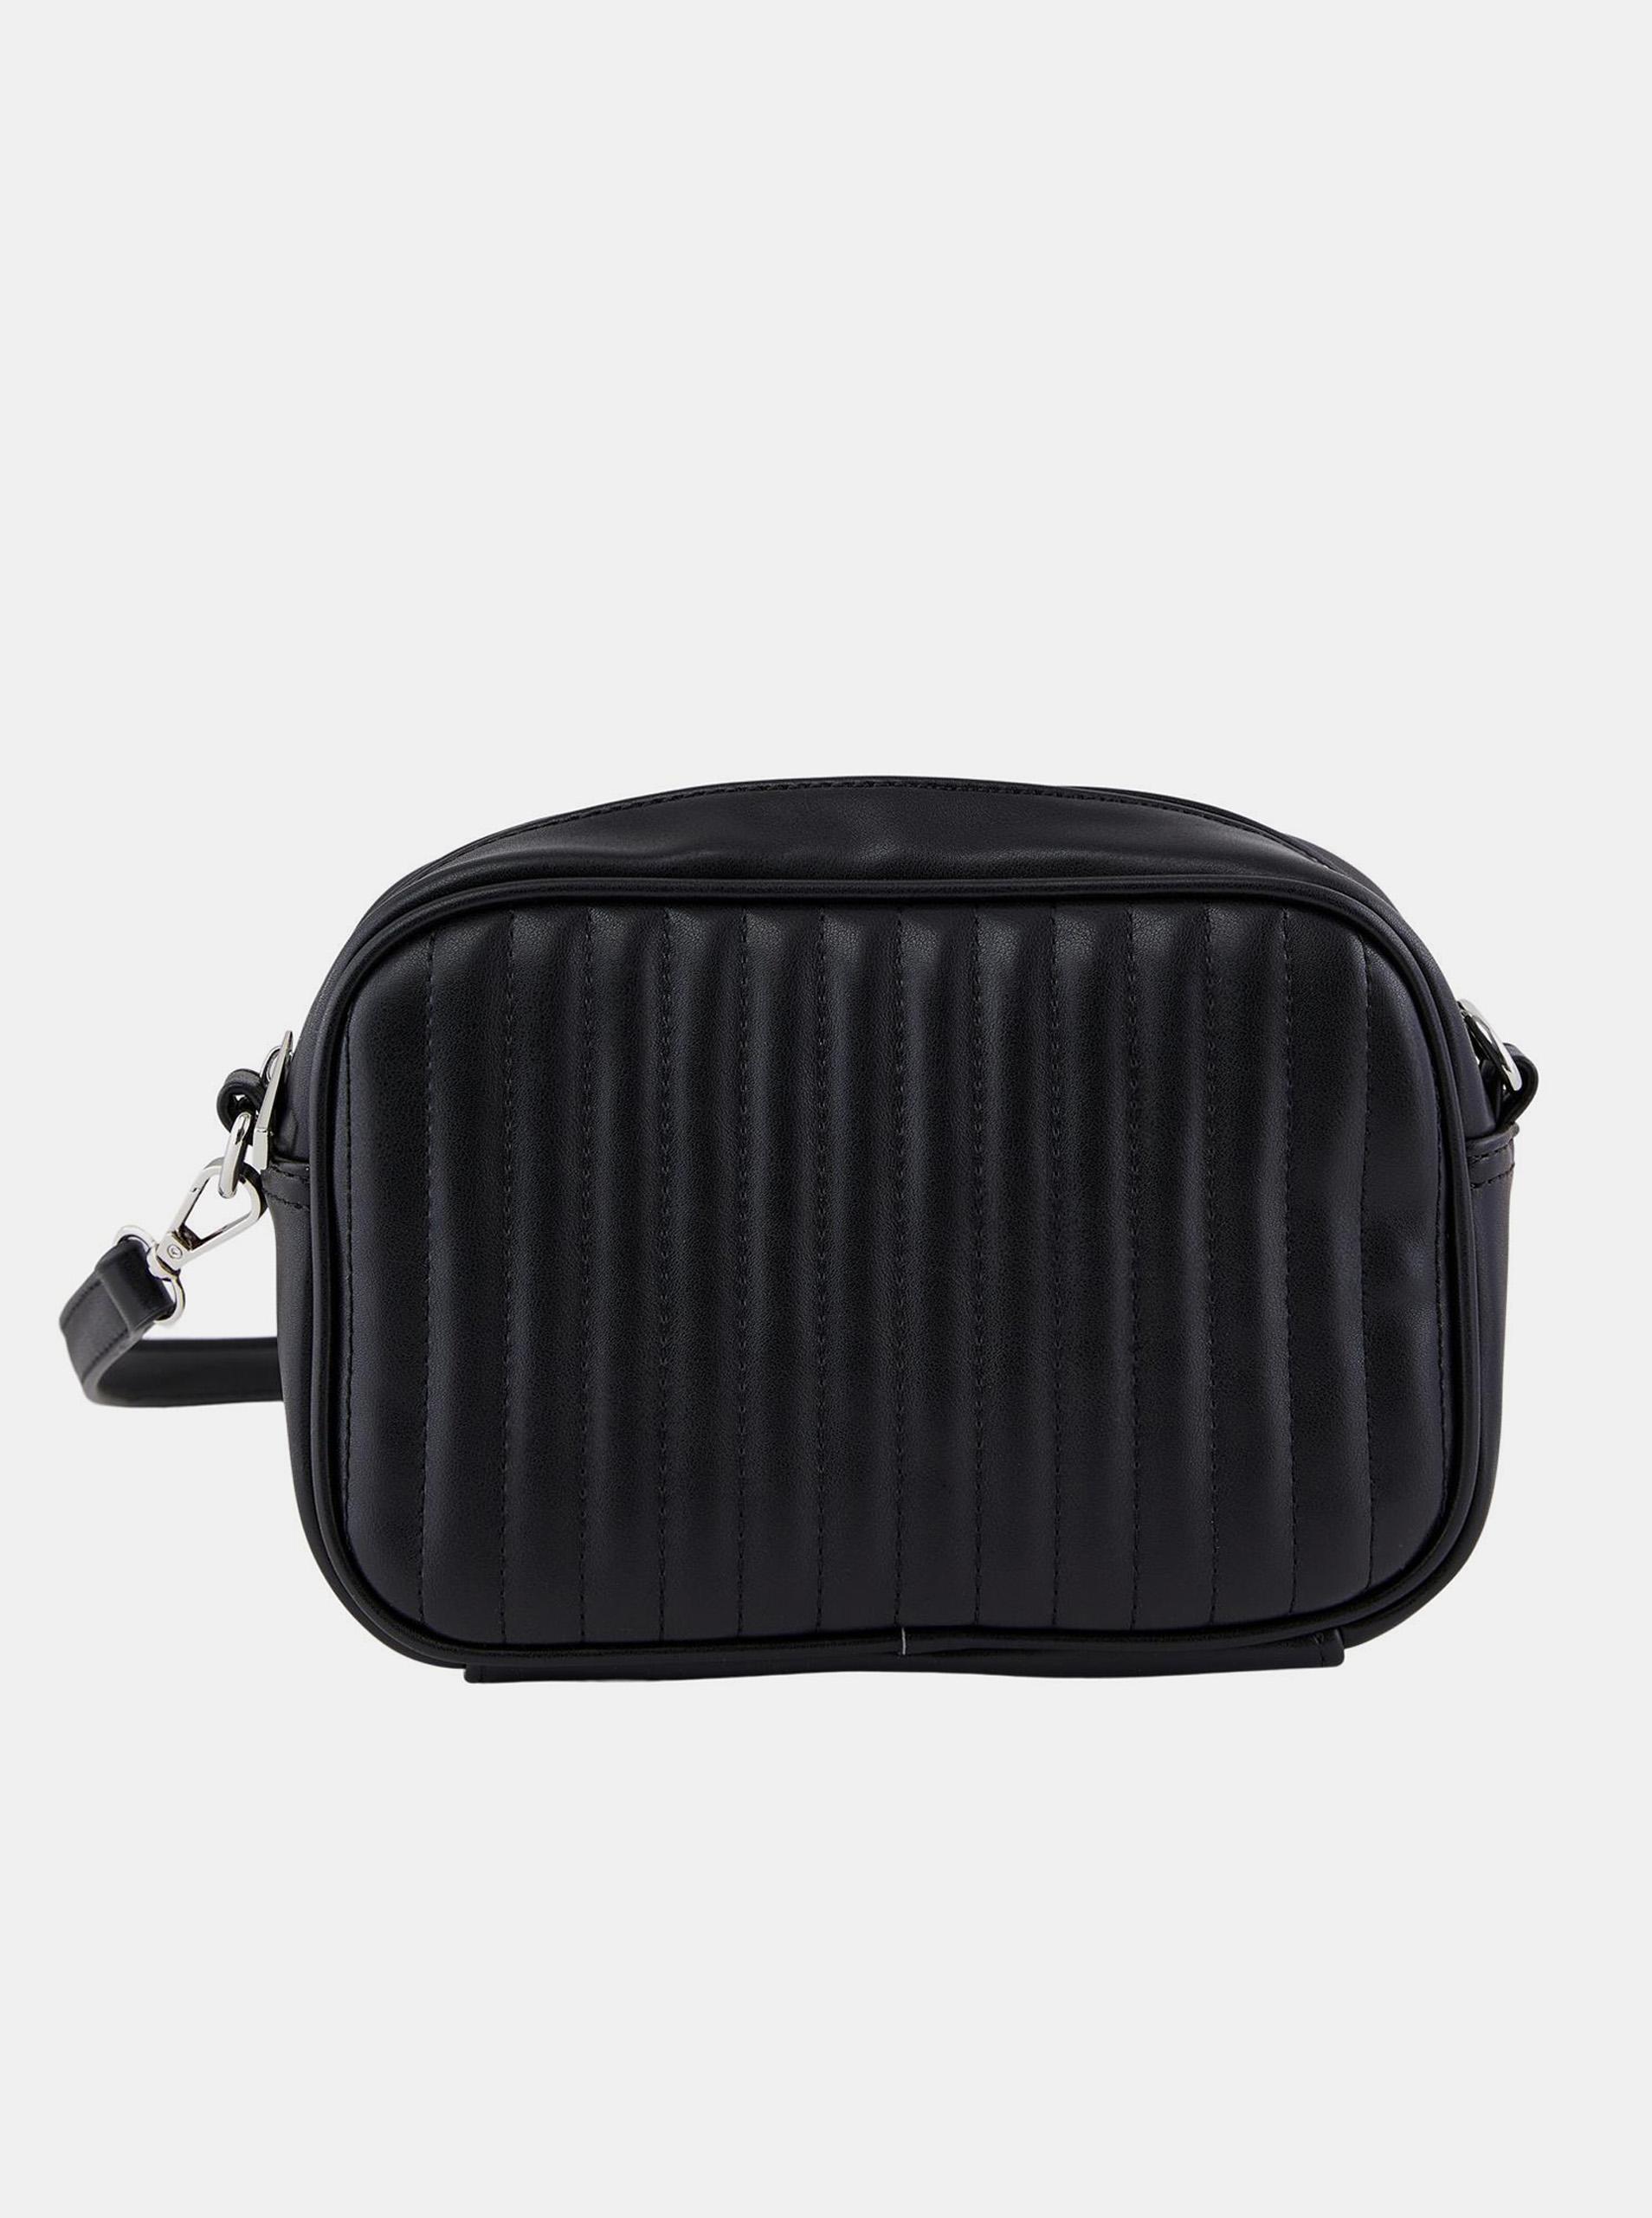 Pieces black crossbody handbag Manja